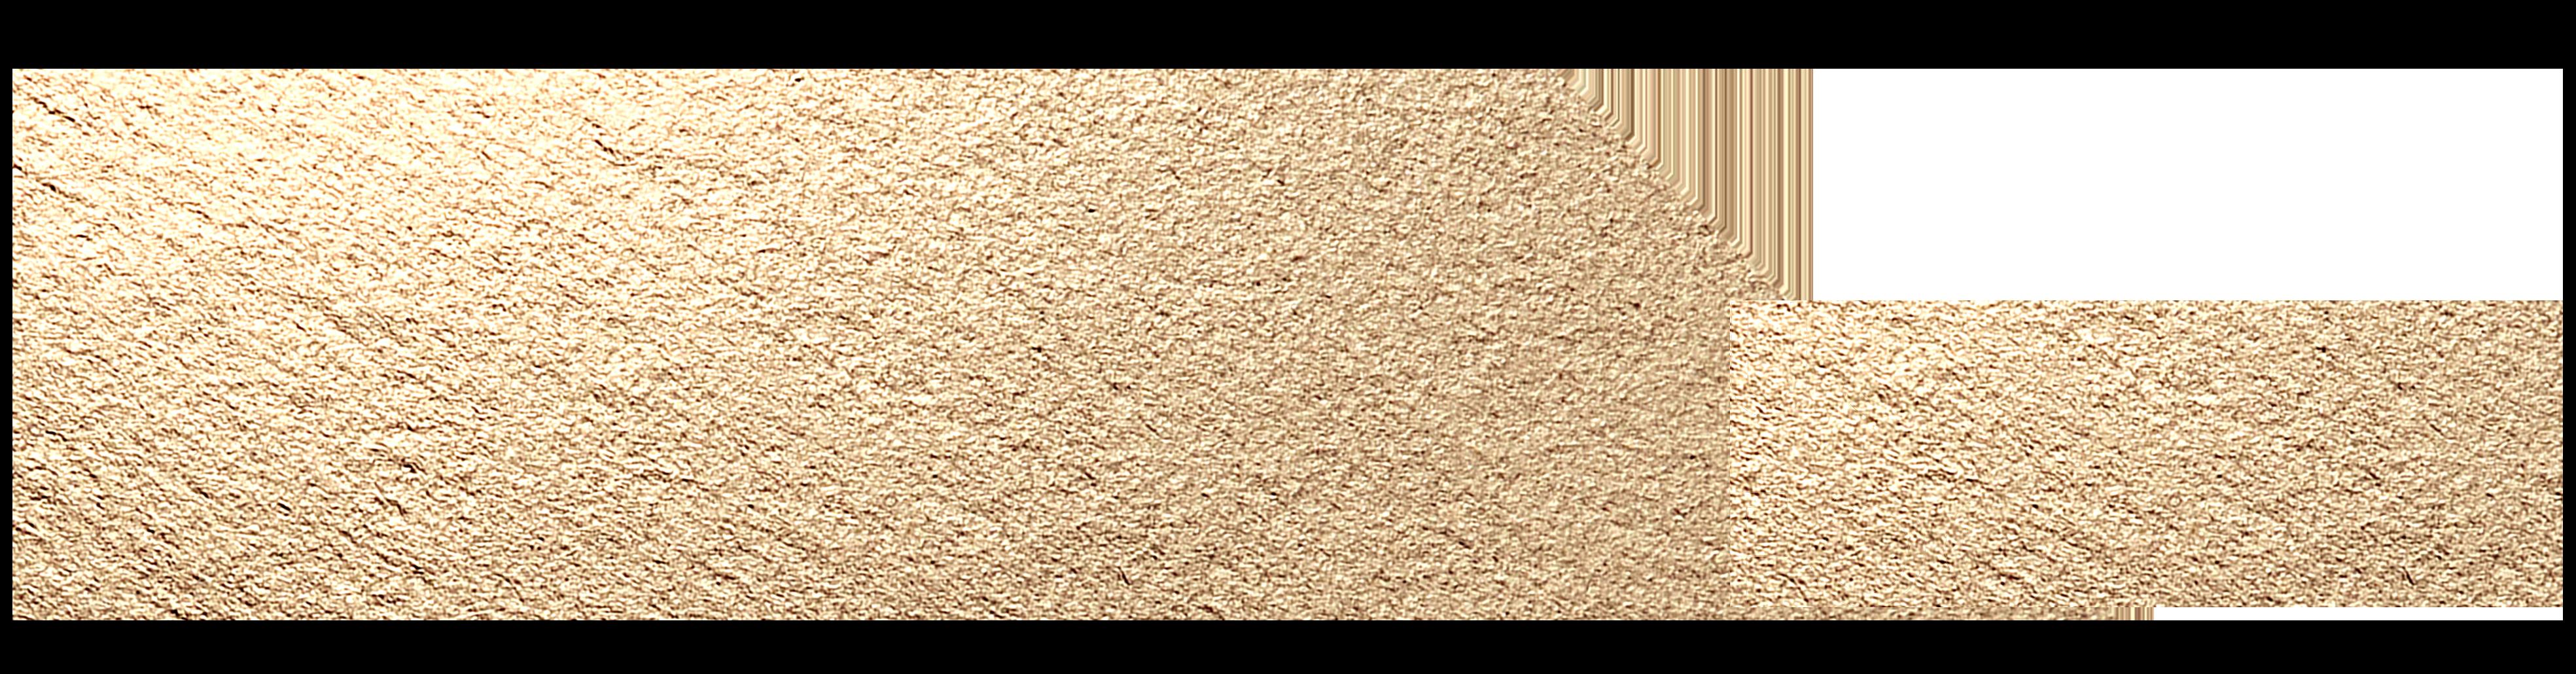 MIC logo Gold Texture RGB 72dpi